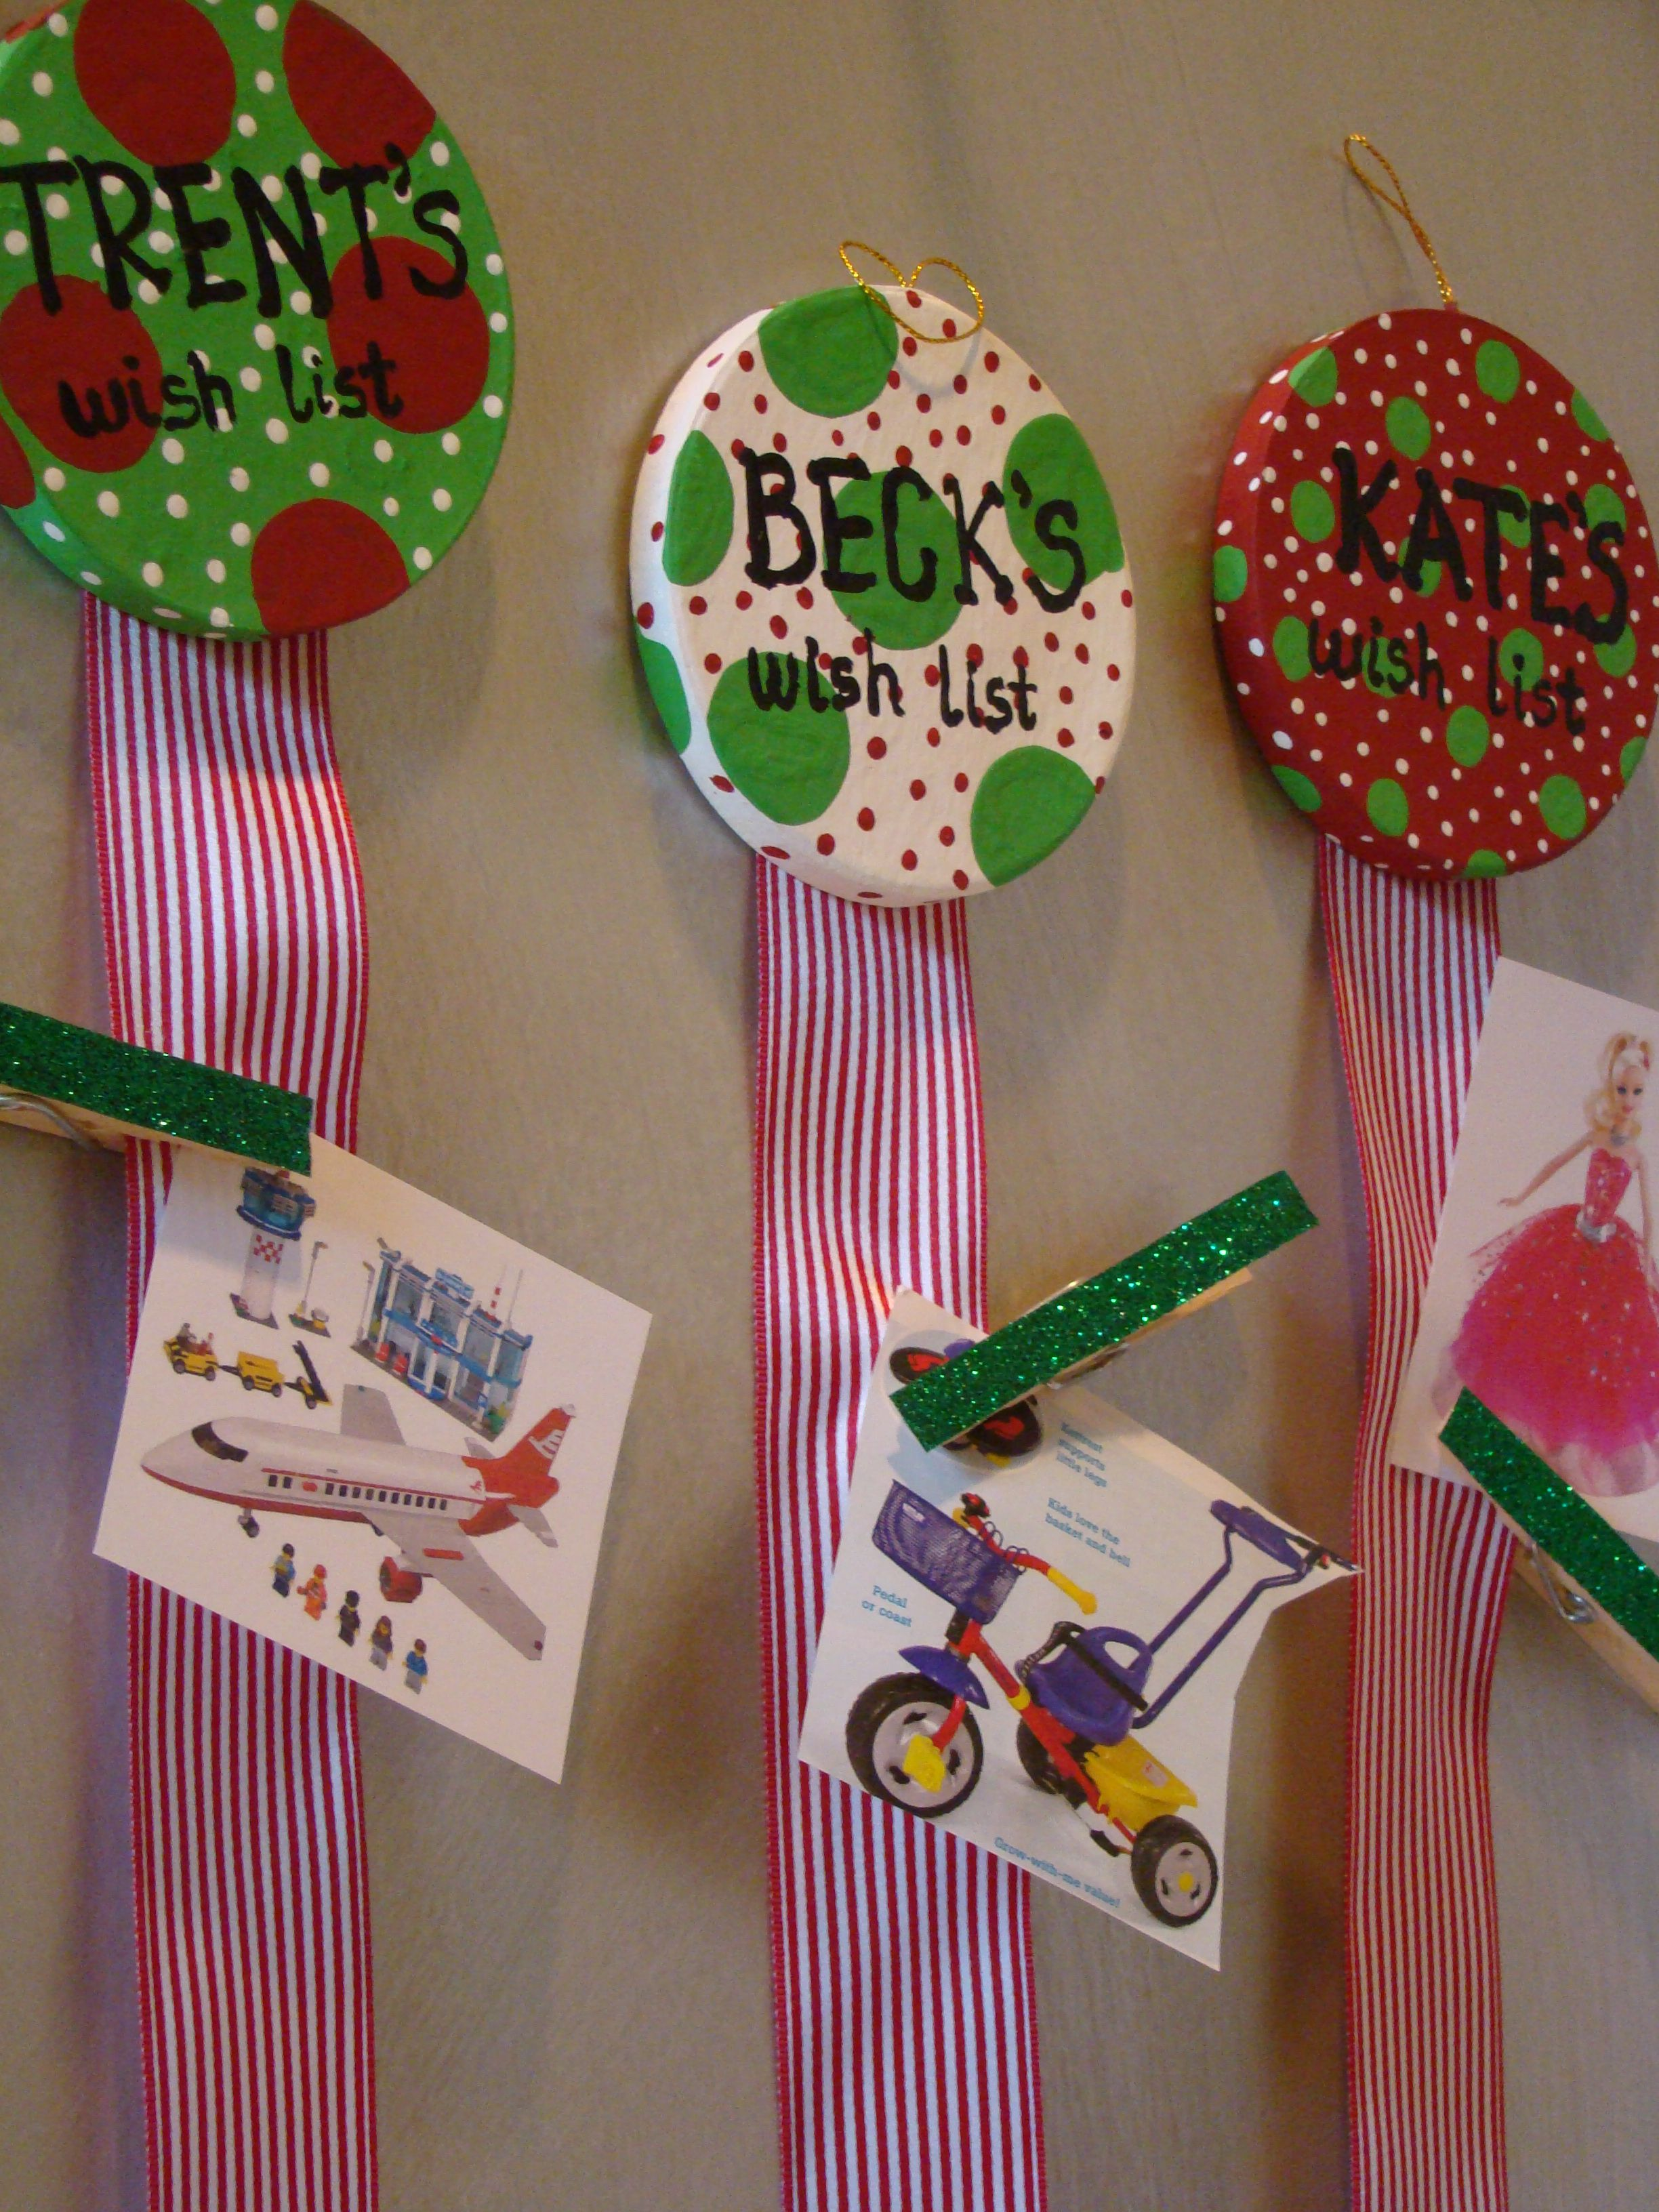 Christmas wish lists for the kids!